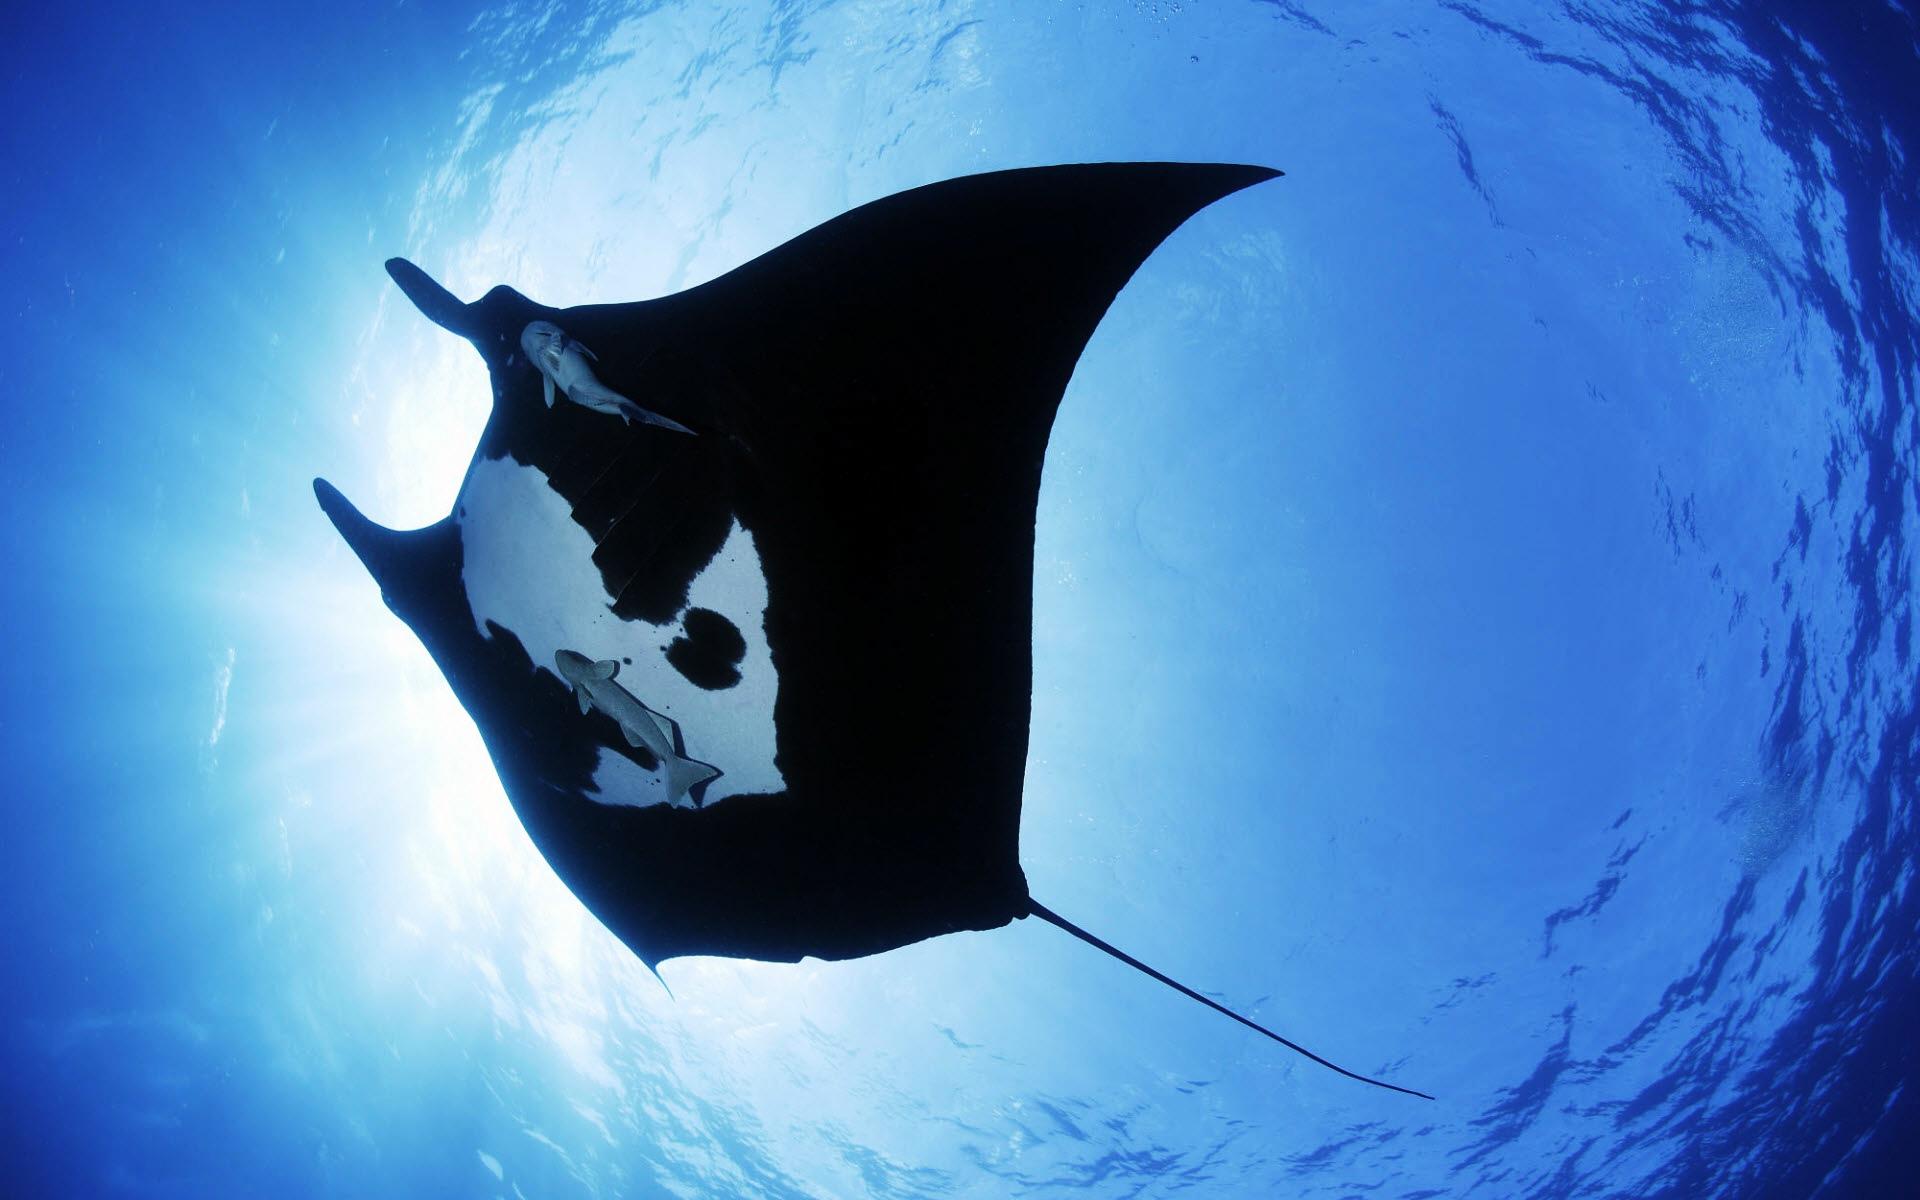 Giant-Oceanic-Manta-Ray-Wallpaper